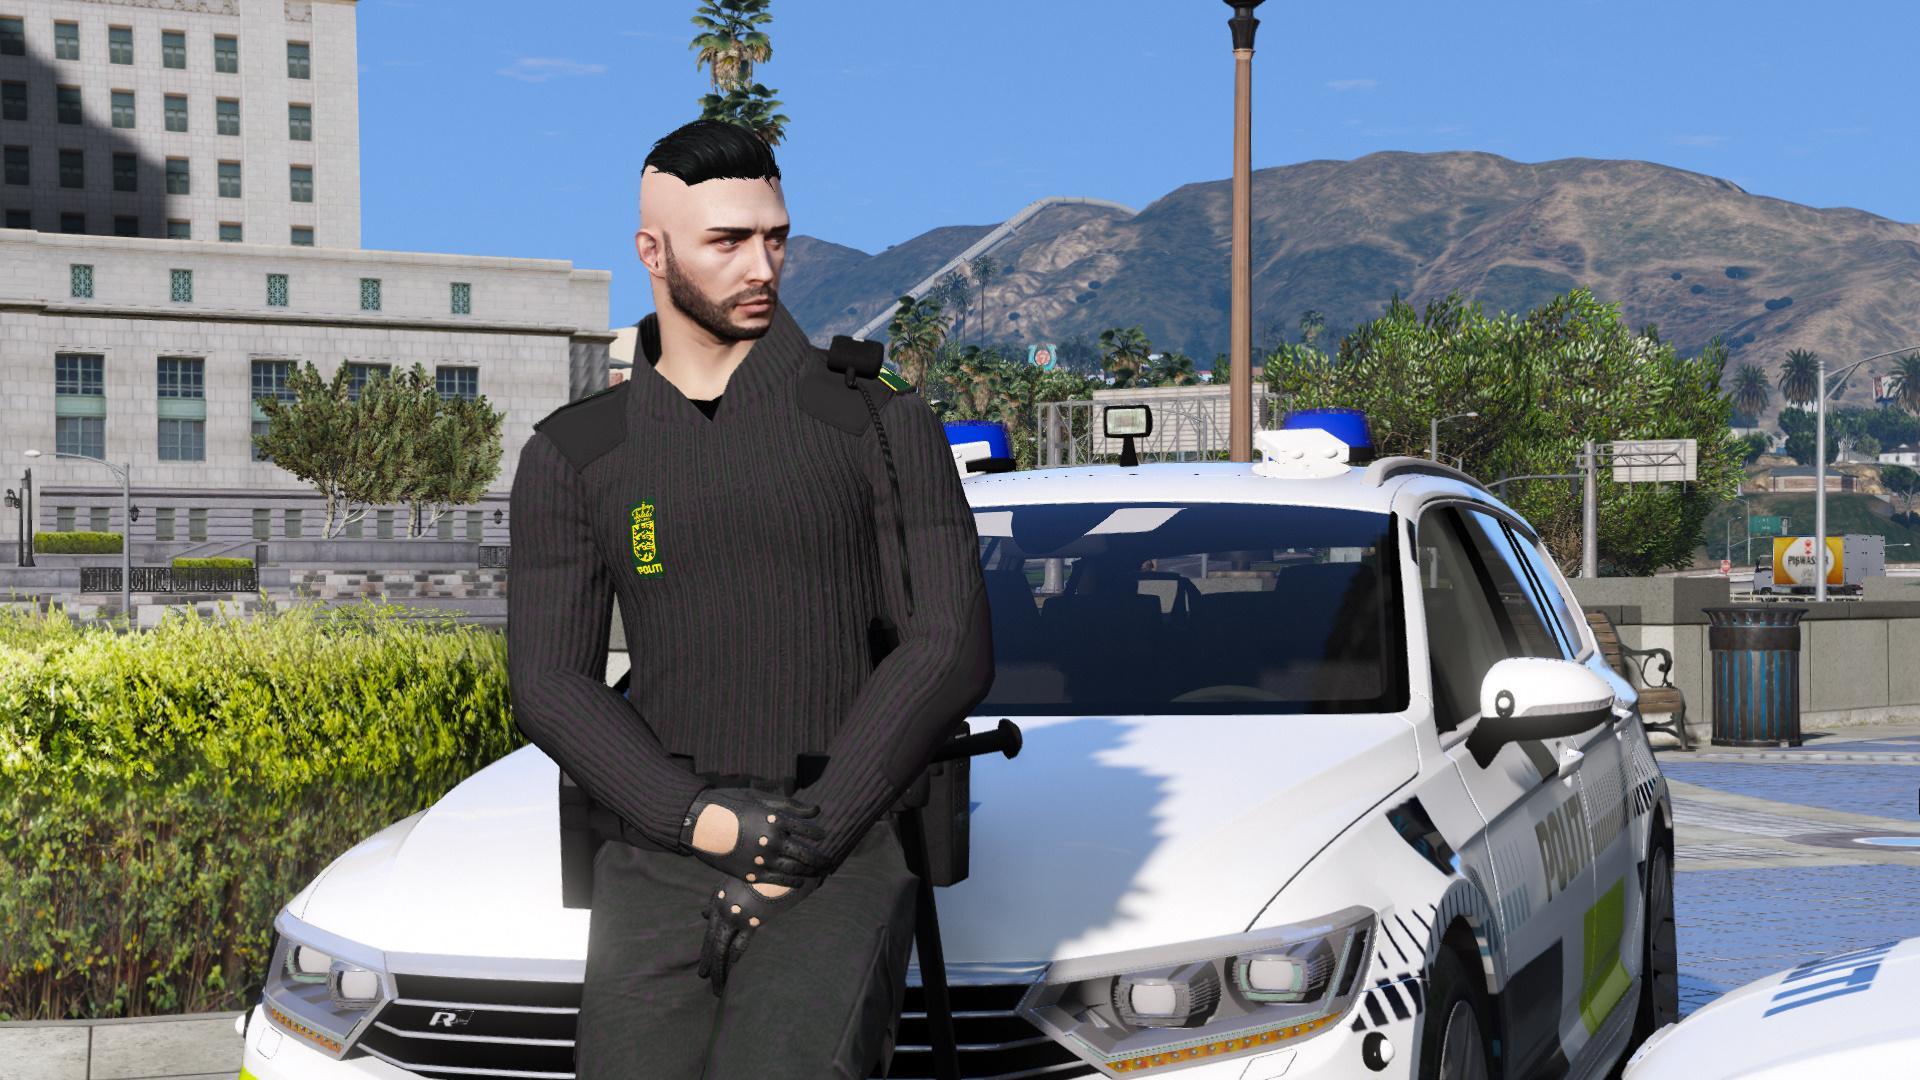 4k Res Danish Eup Police Uniform Pack Gta5 Mods Com